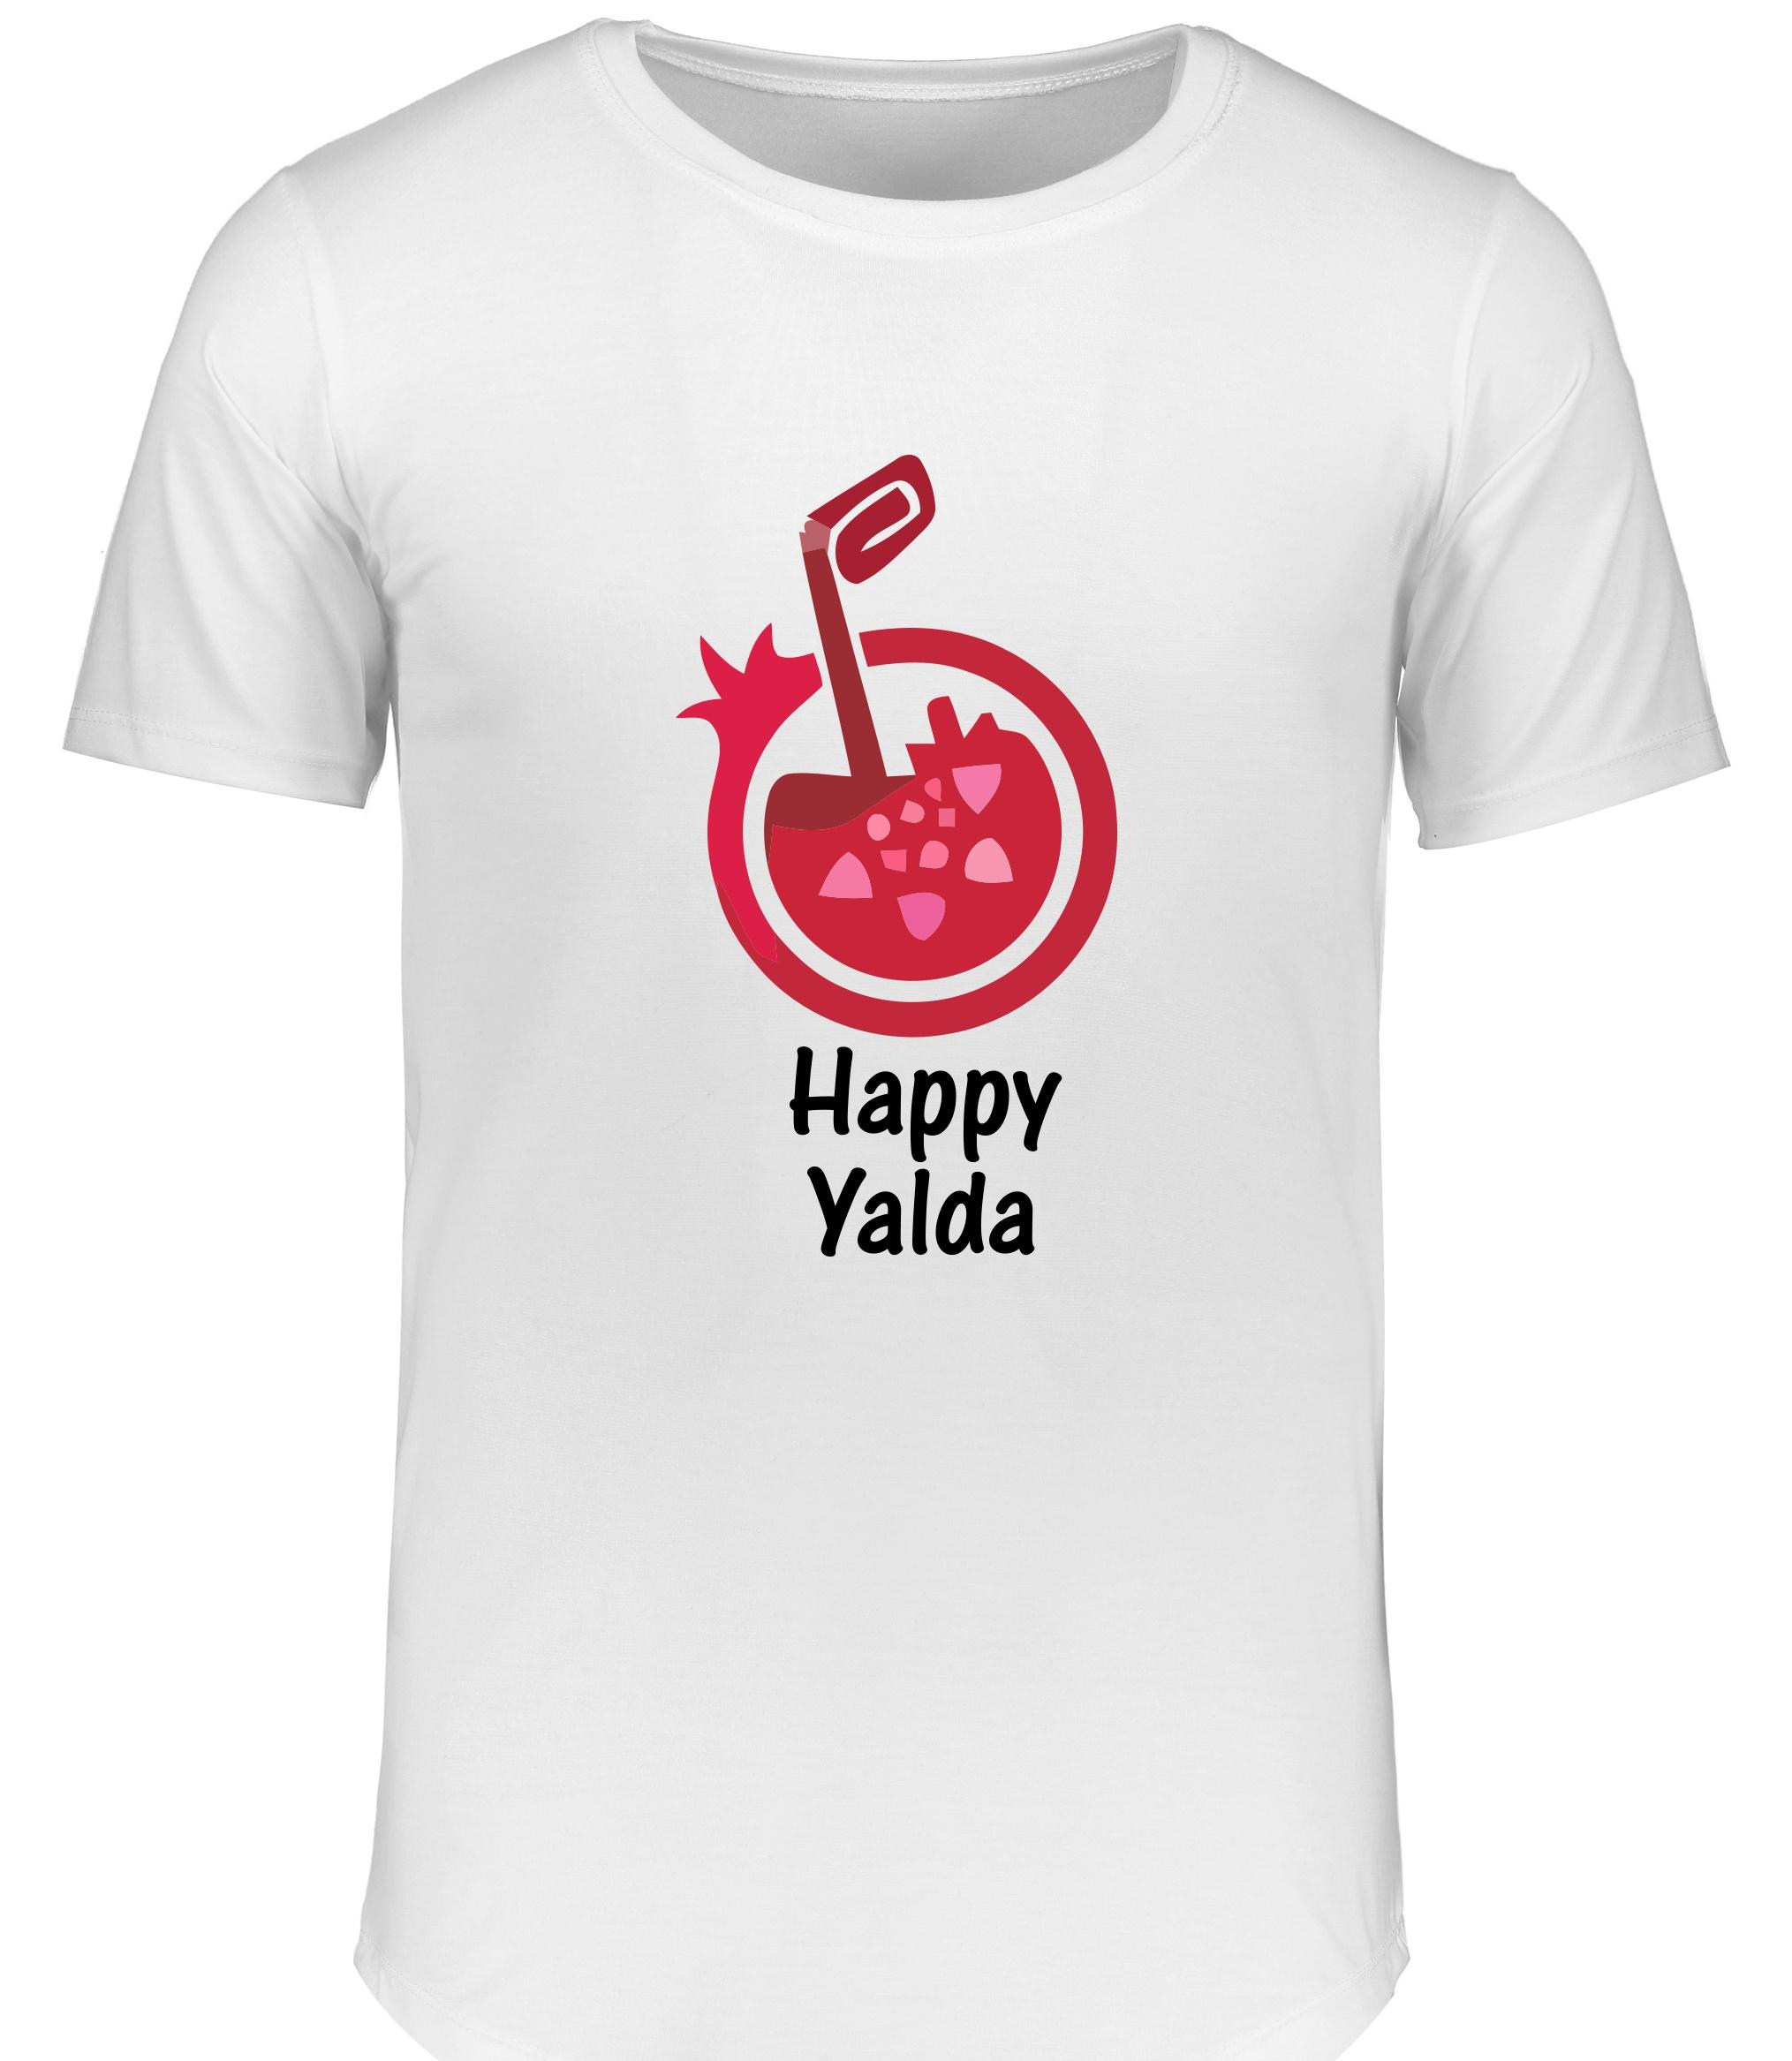 تی شرت زنانه طرح شب یلدا کد 15490